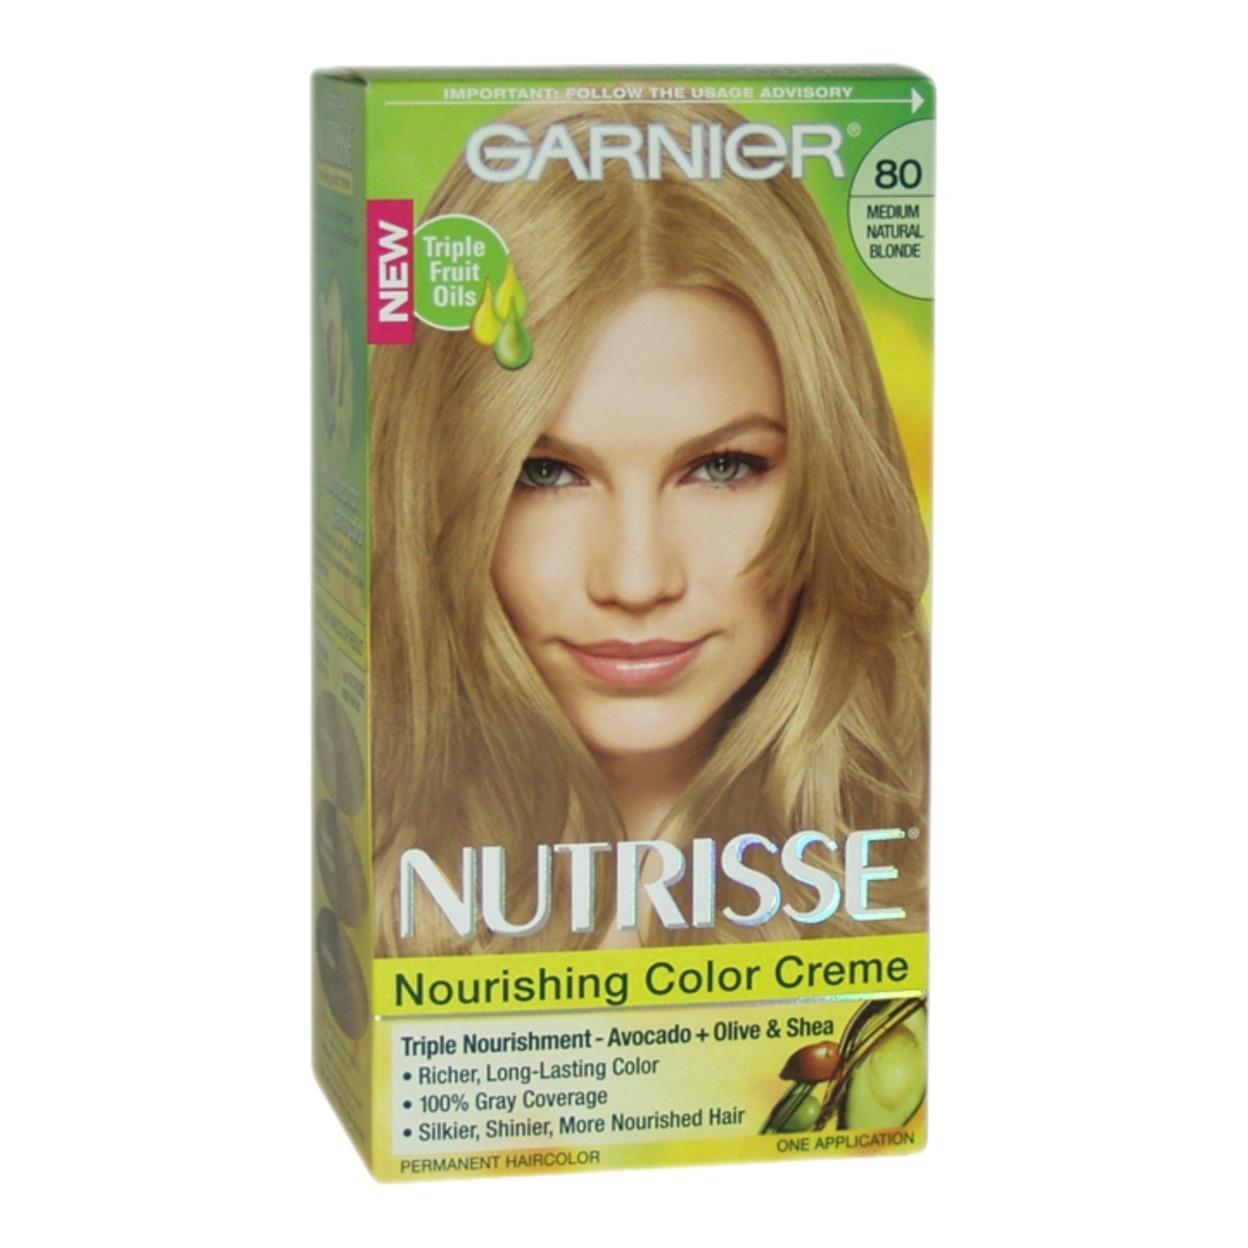 Nutrisse Nourishing Color Creme 80 Medium Natural Blonde By